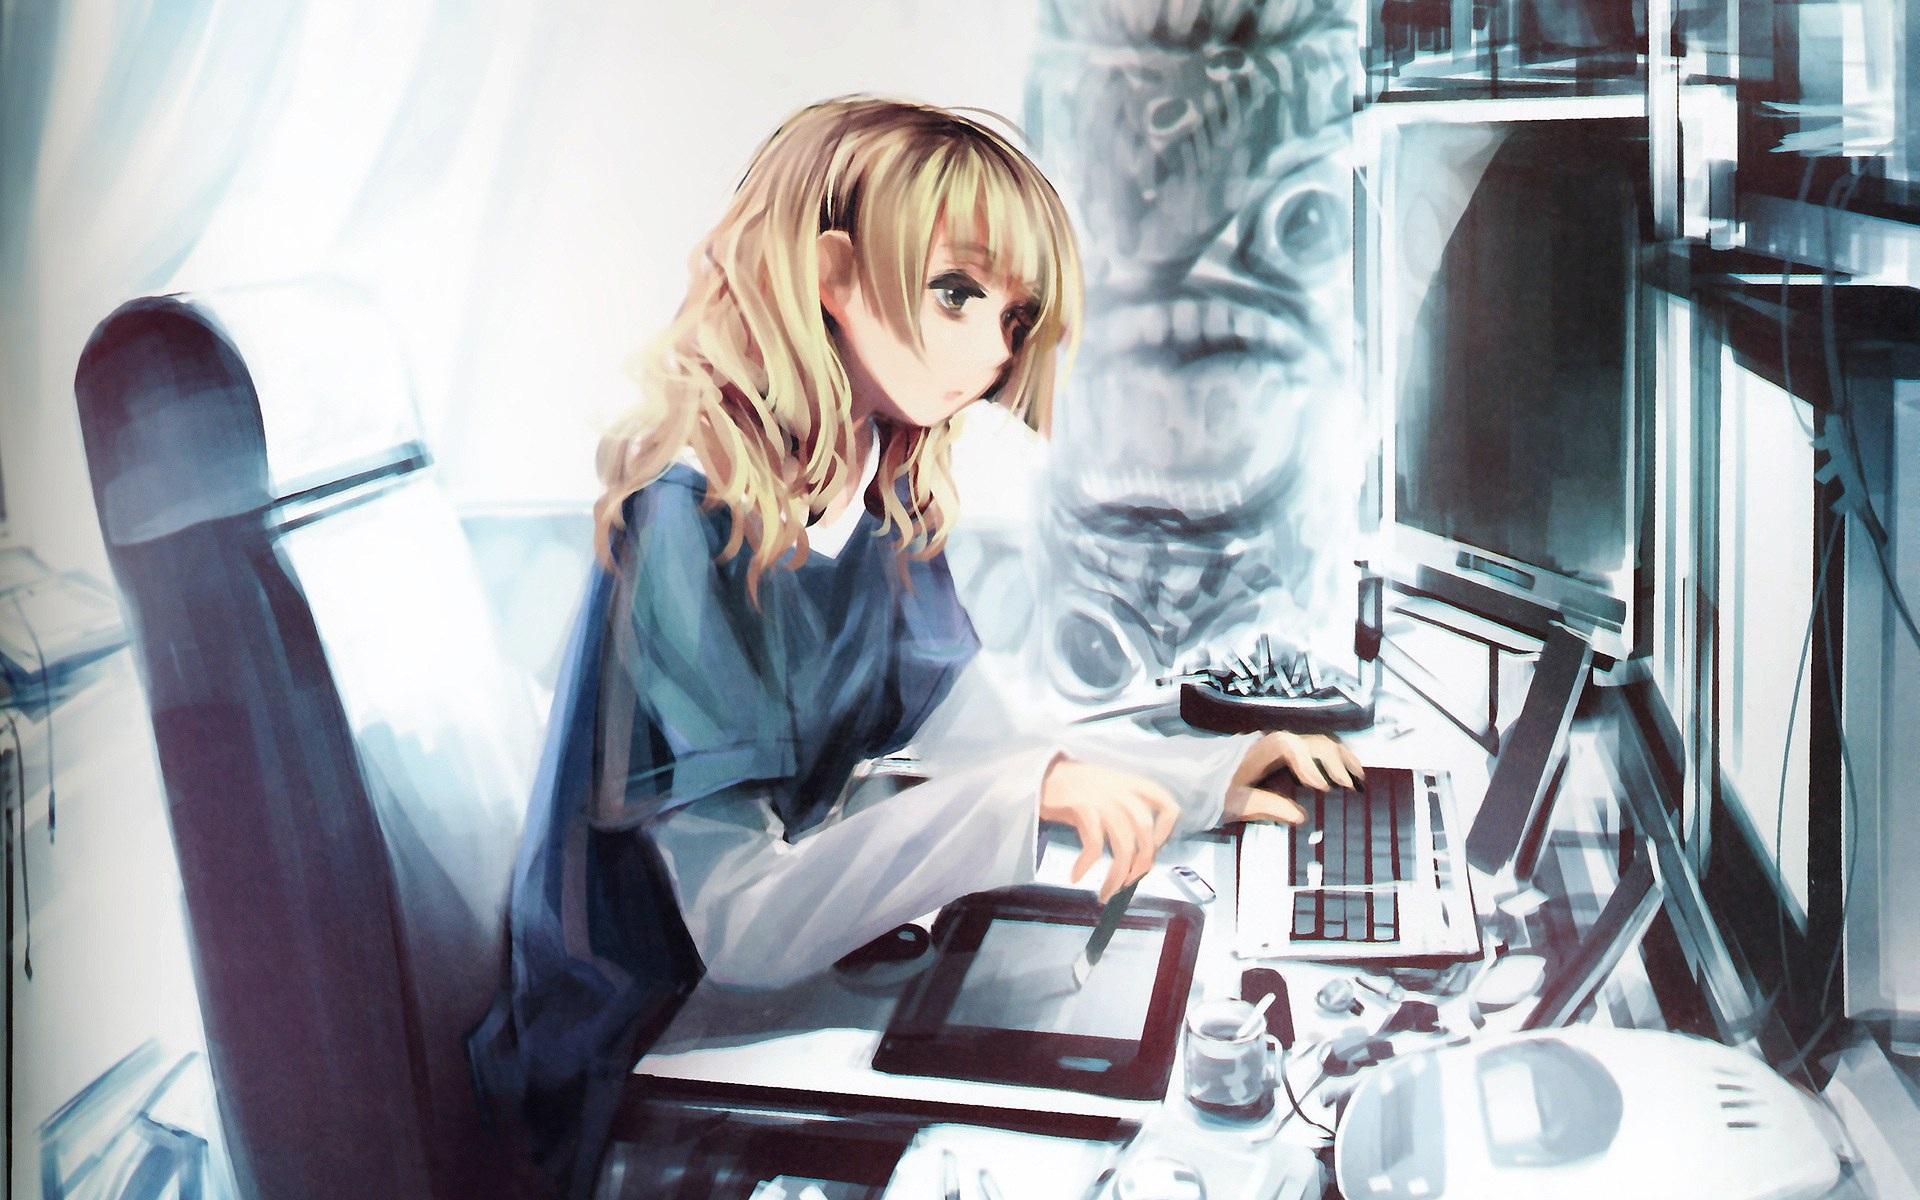 Unduh 5500 Wallpaper Anime Hd Computer Gambar Gratis